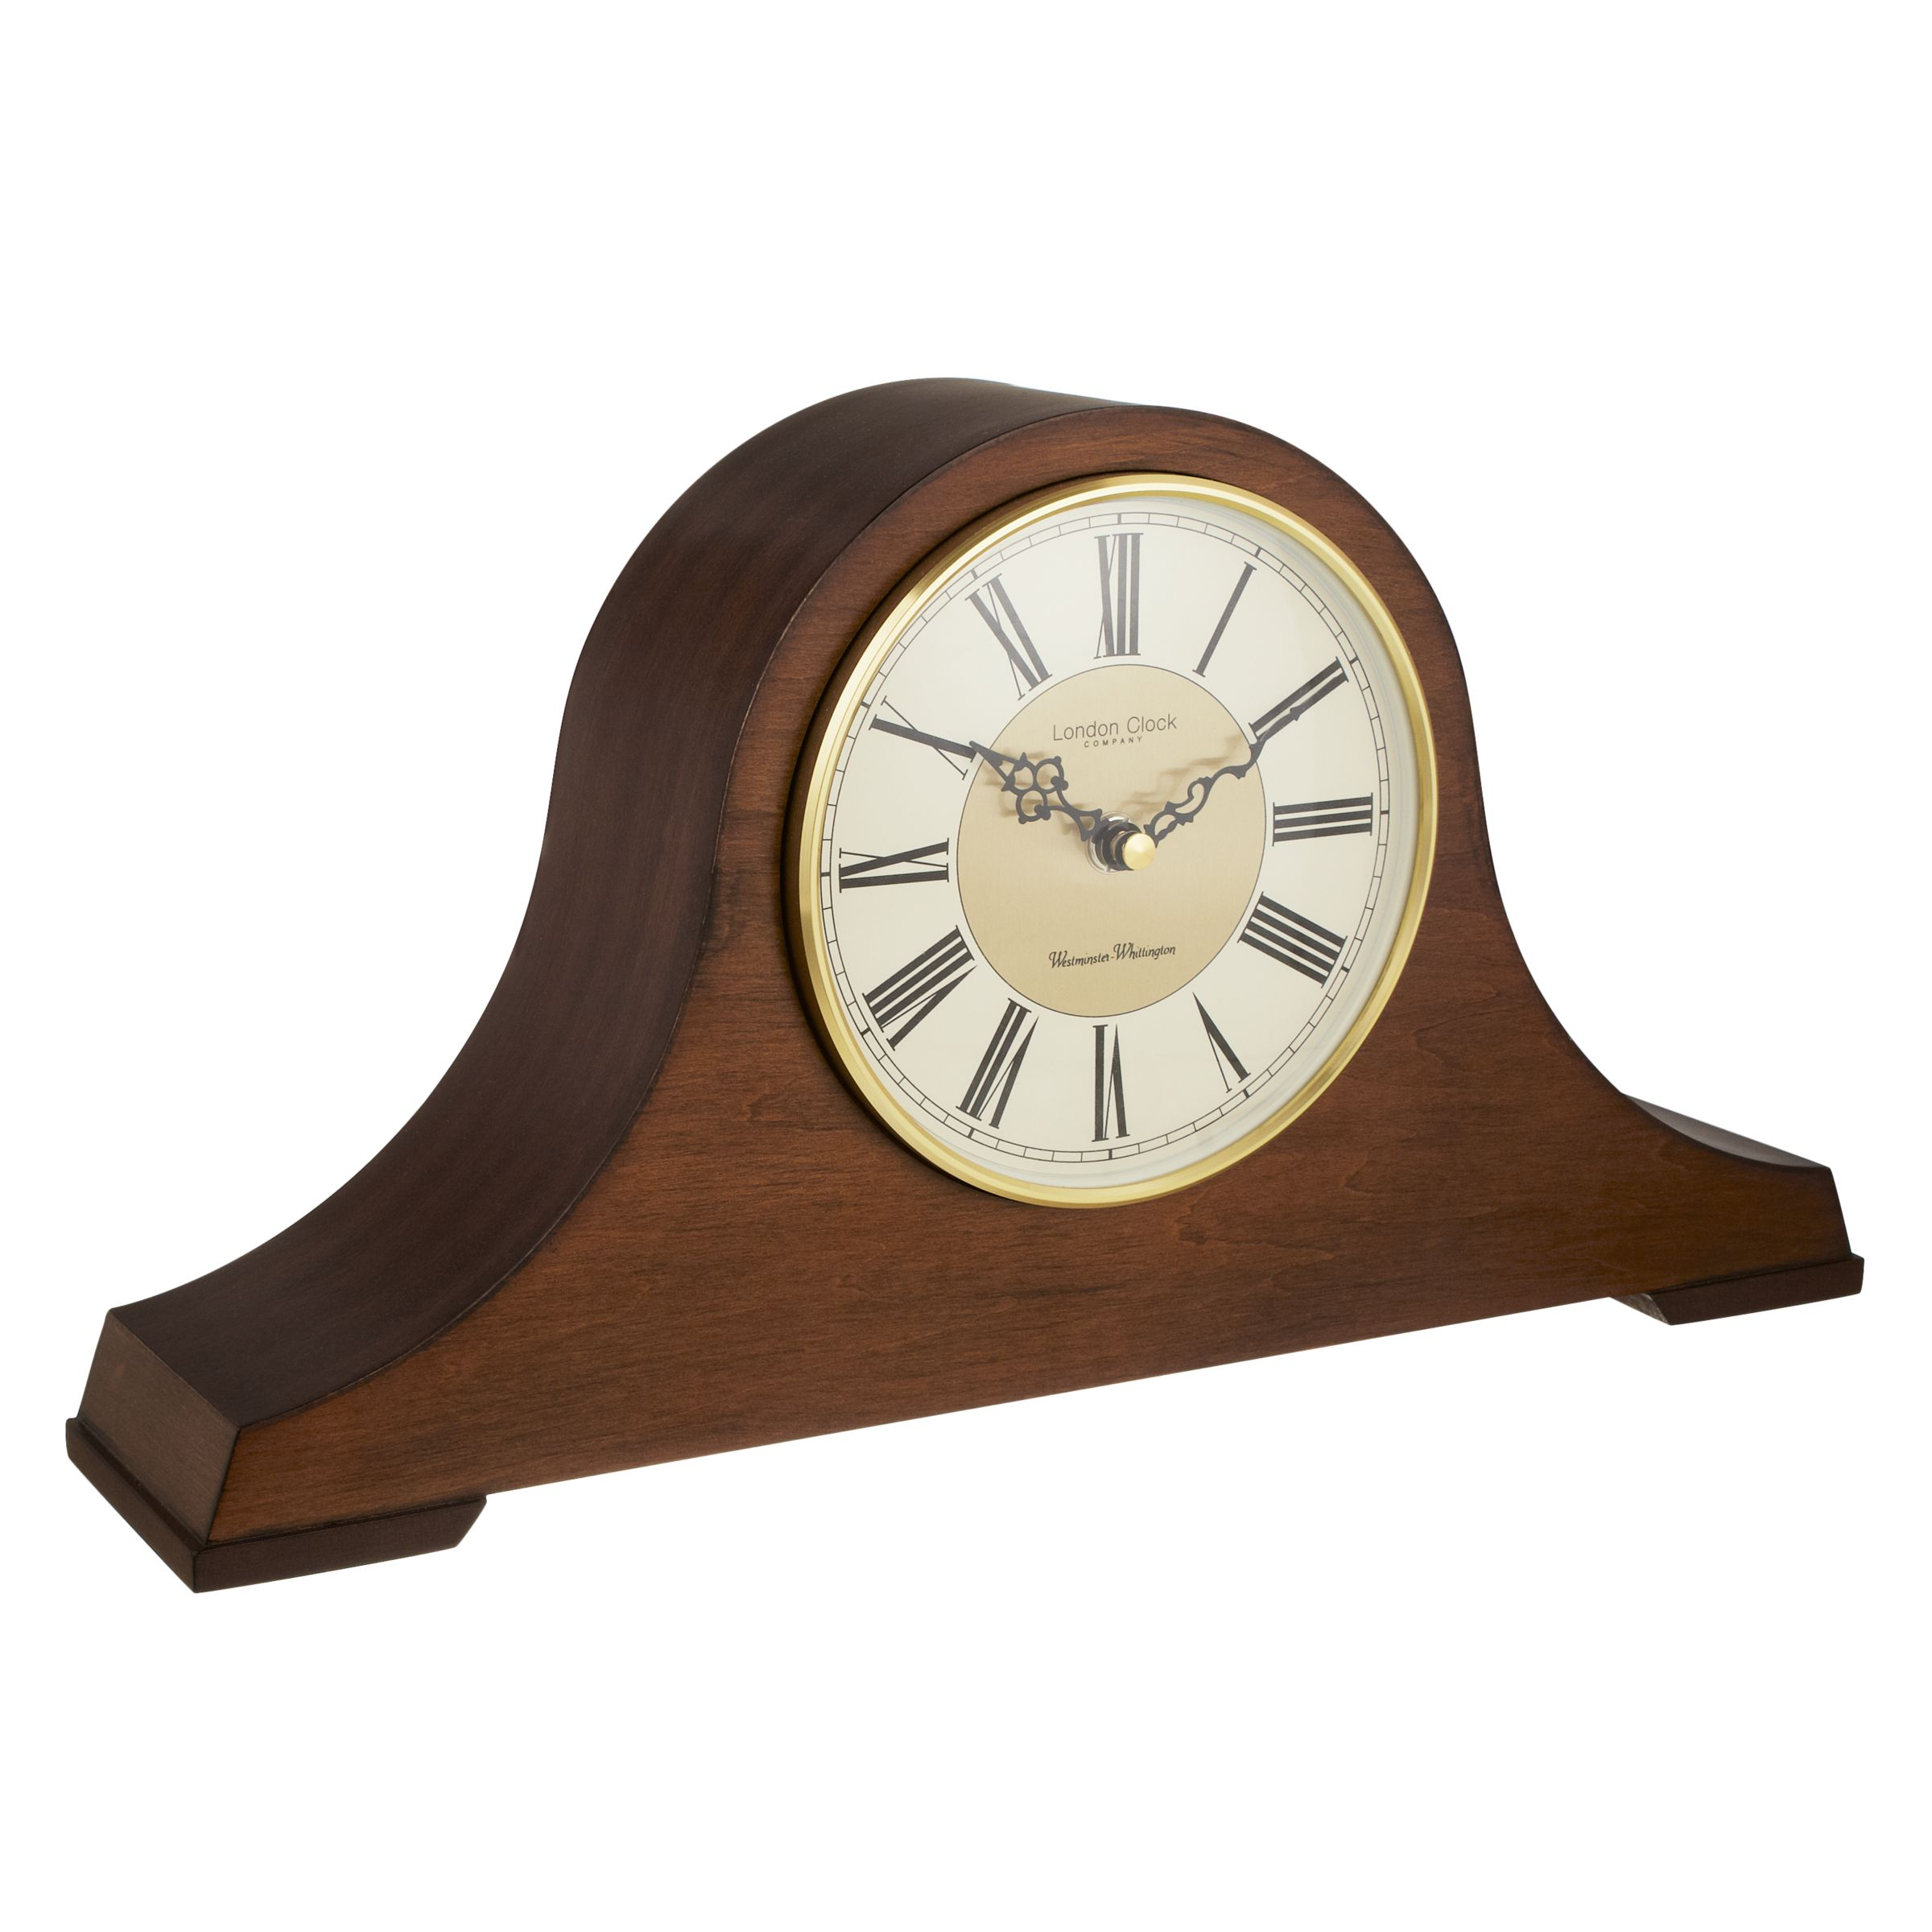 London Clock Company London Clock Company Napoleon Mantel Clock